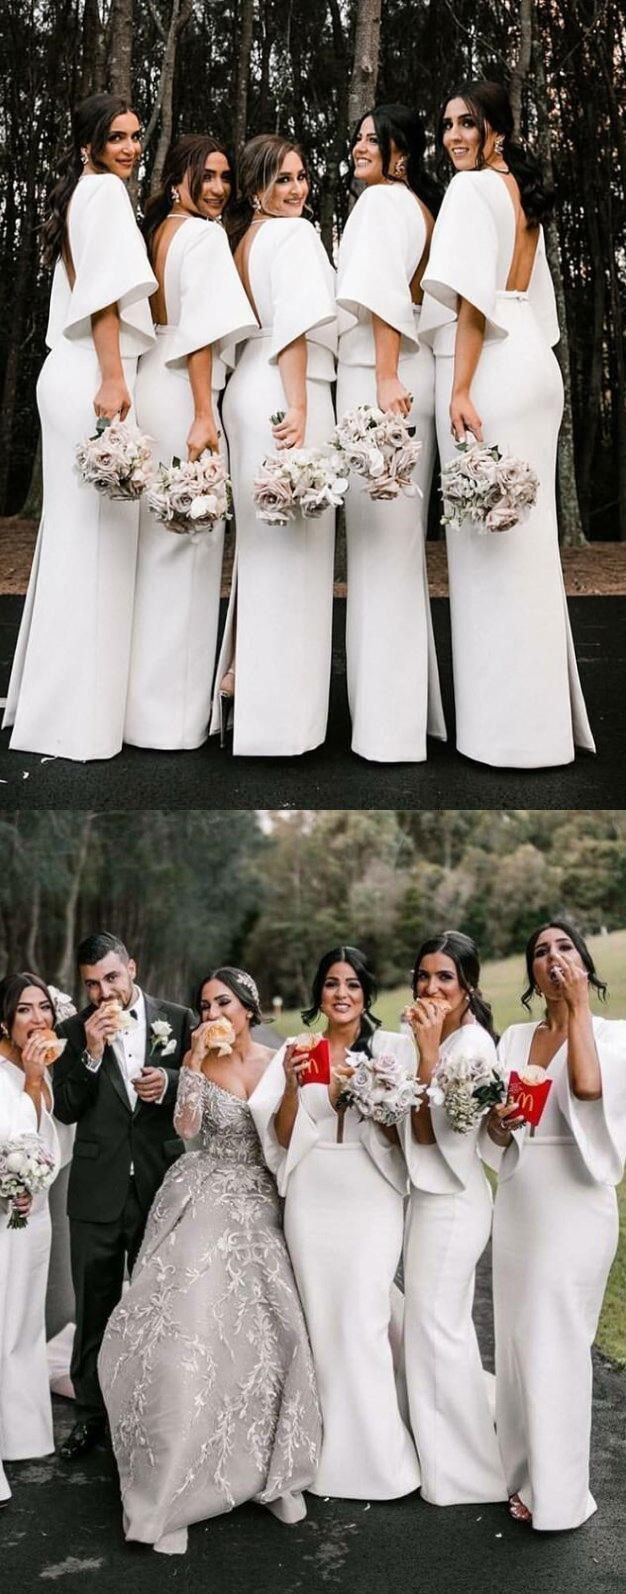 Fashion Unique Design Deep V Neck Floor Length White Satin Bridesmaid Dresses W Satin Bridesmaid Dresses White Bridesmaid Dresses White Bridesmaid Dresses Long